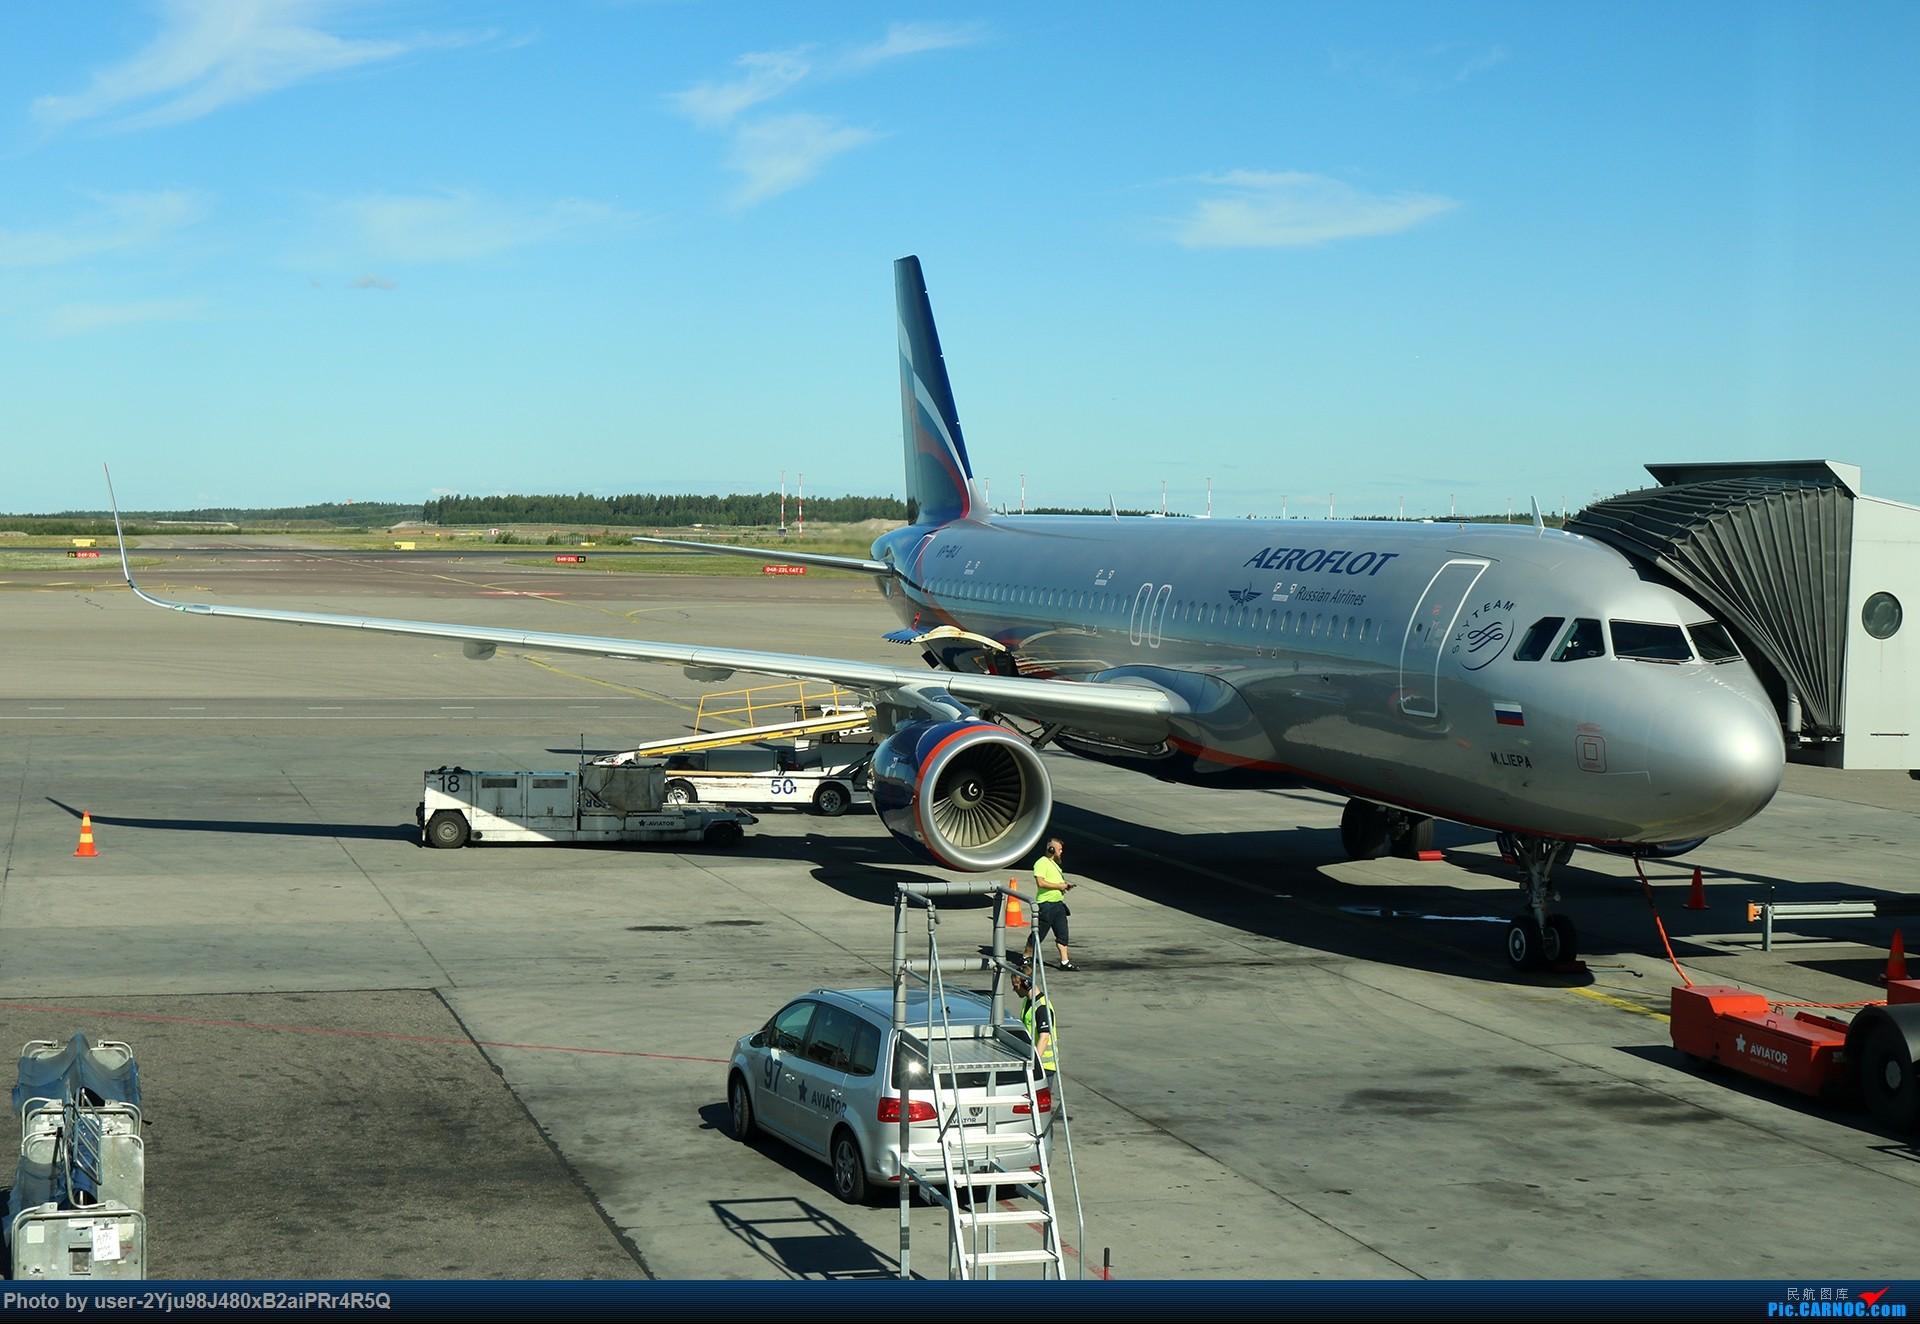 Re:[原创]LIULIU|一天两种机型三个国家四段航线五座城市的回家之路|西伯利亚上空的星光 AIRBUS A320-214(SL) VP-BIJ 芬兰赫尔辛基-万塔机场